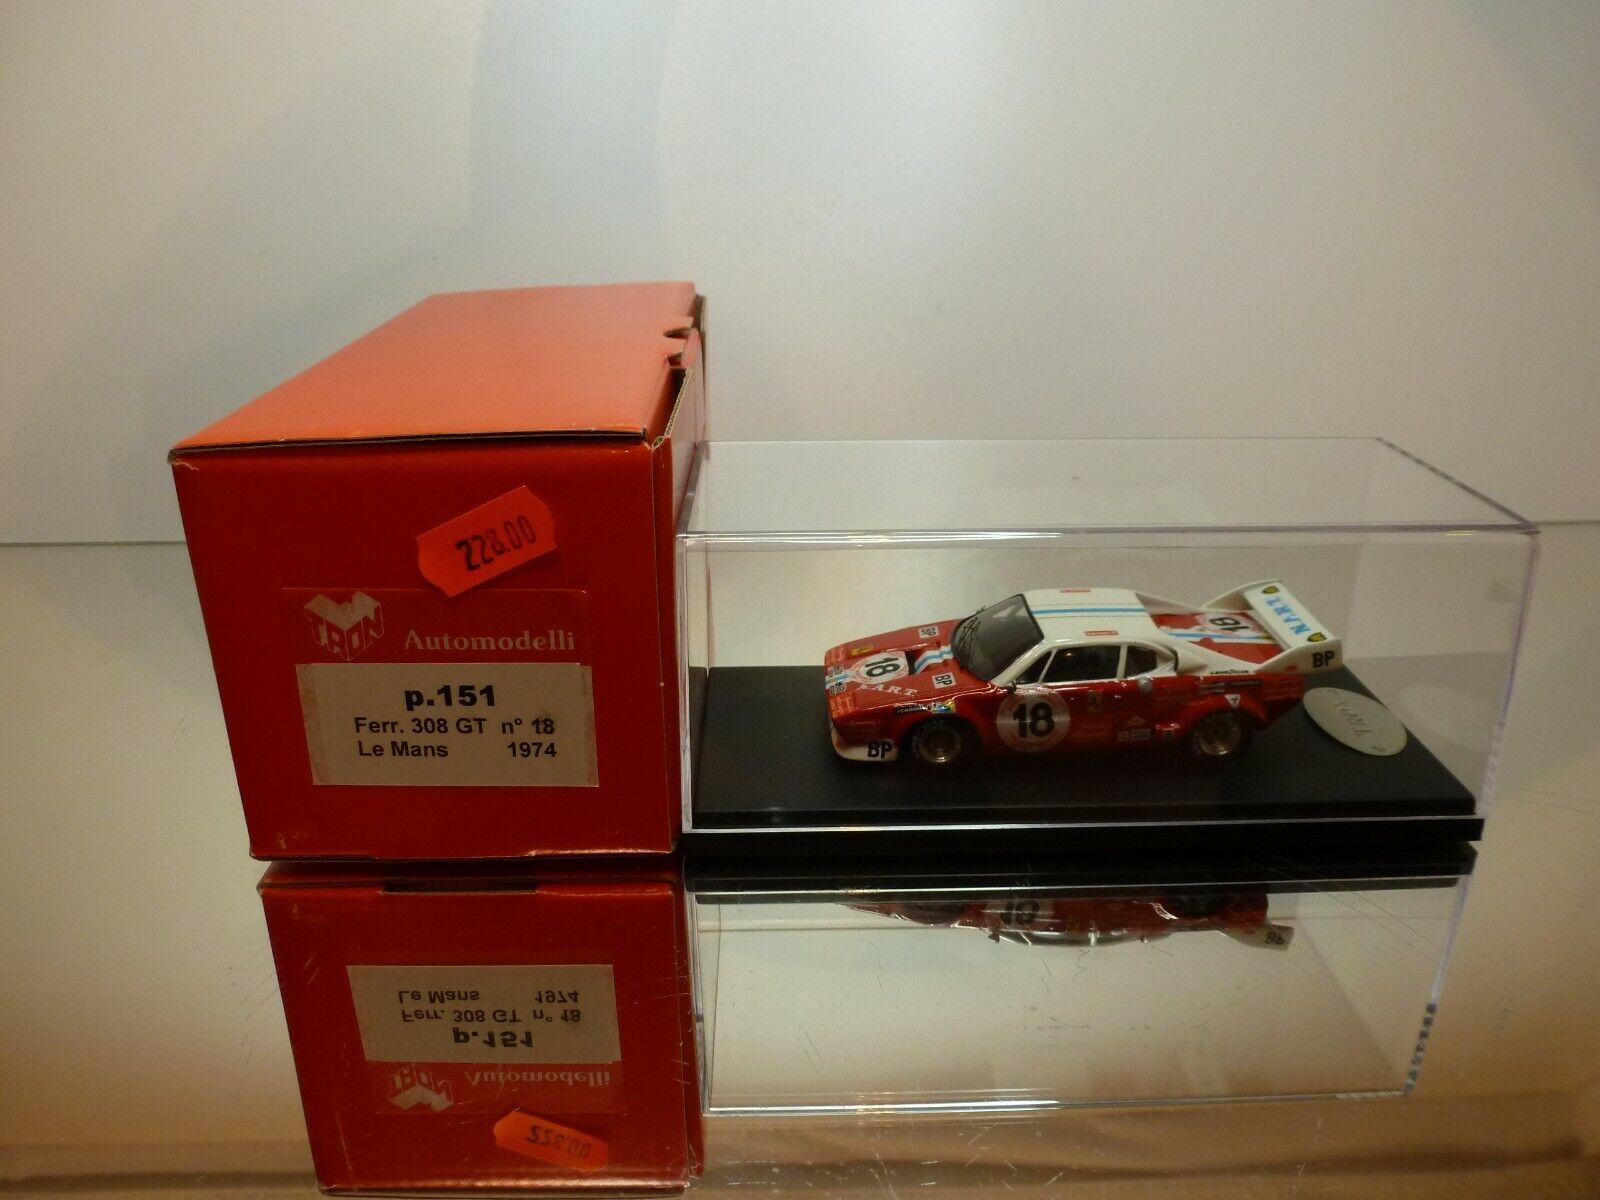 TRON P151 FERRARI DINO 308 GT4 LE MANS 1974  18 - rot 1 43 - MINT IN BOX